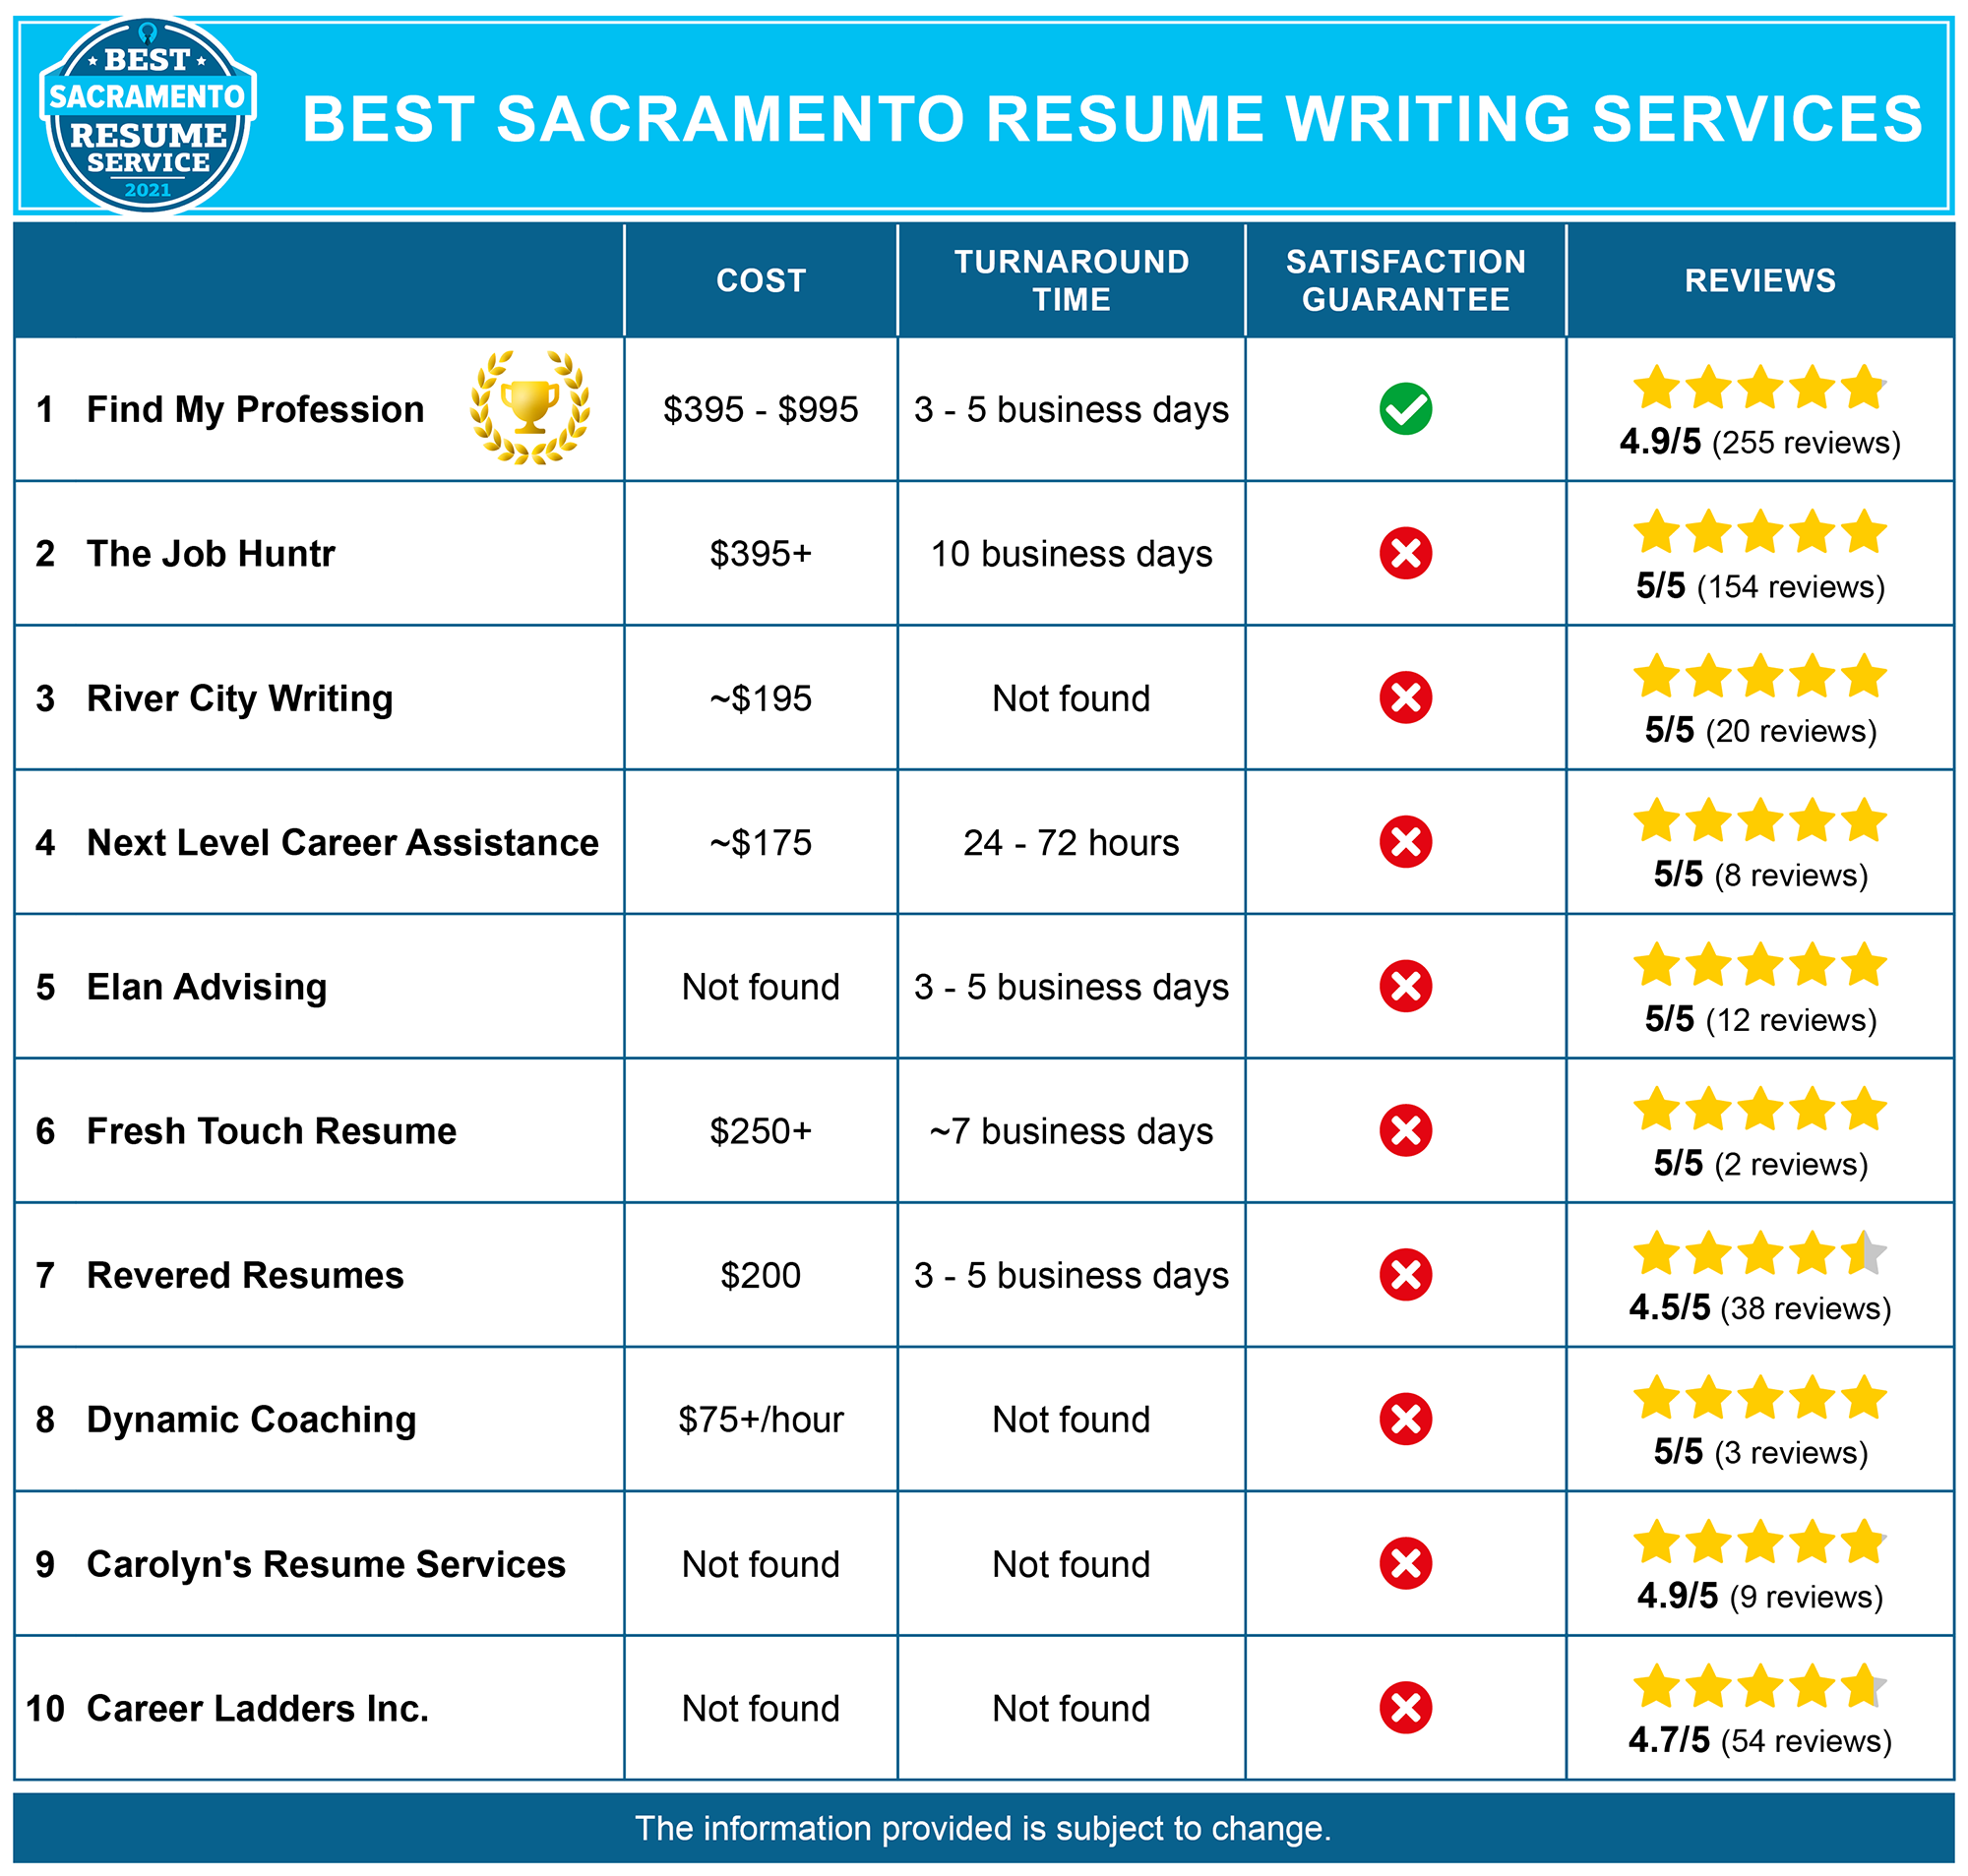 Best Sacramento Resume Writing Service